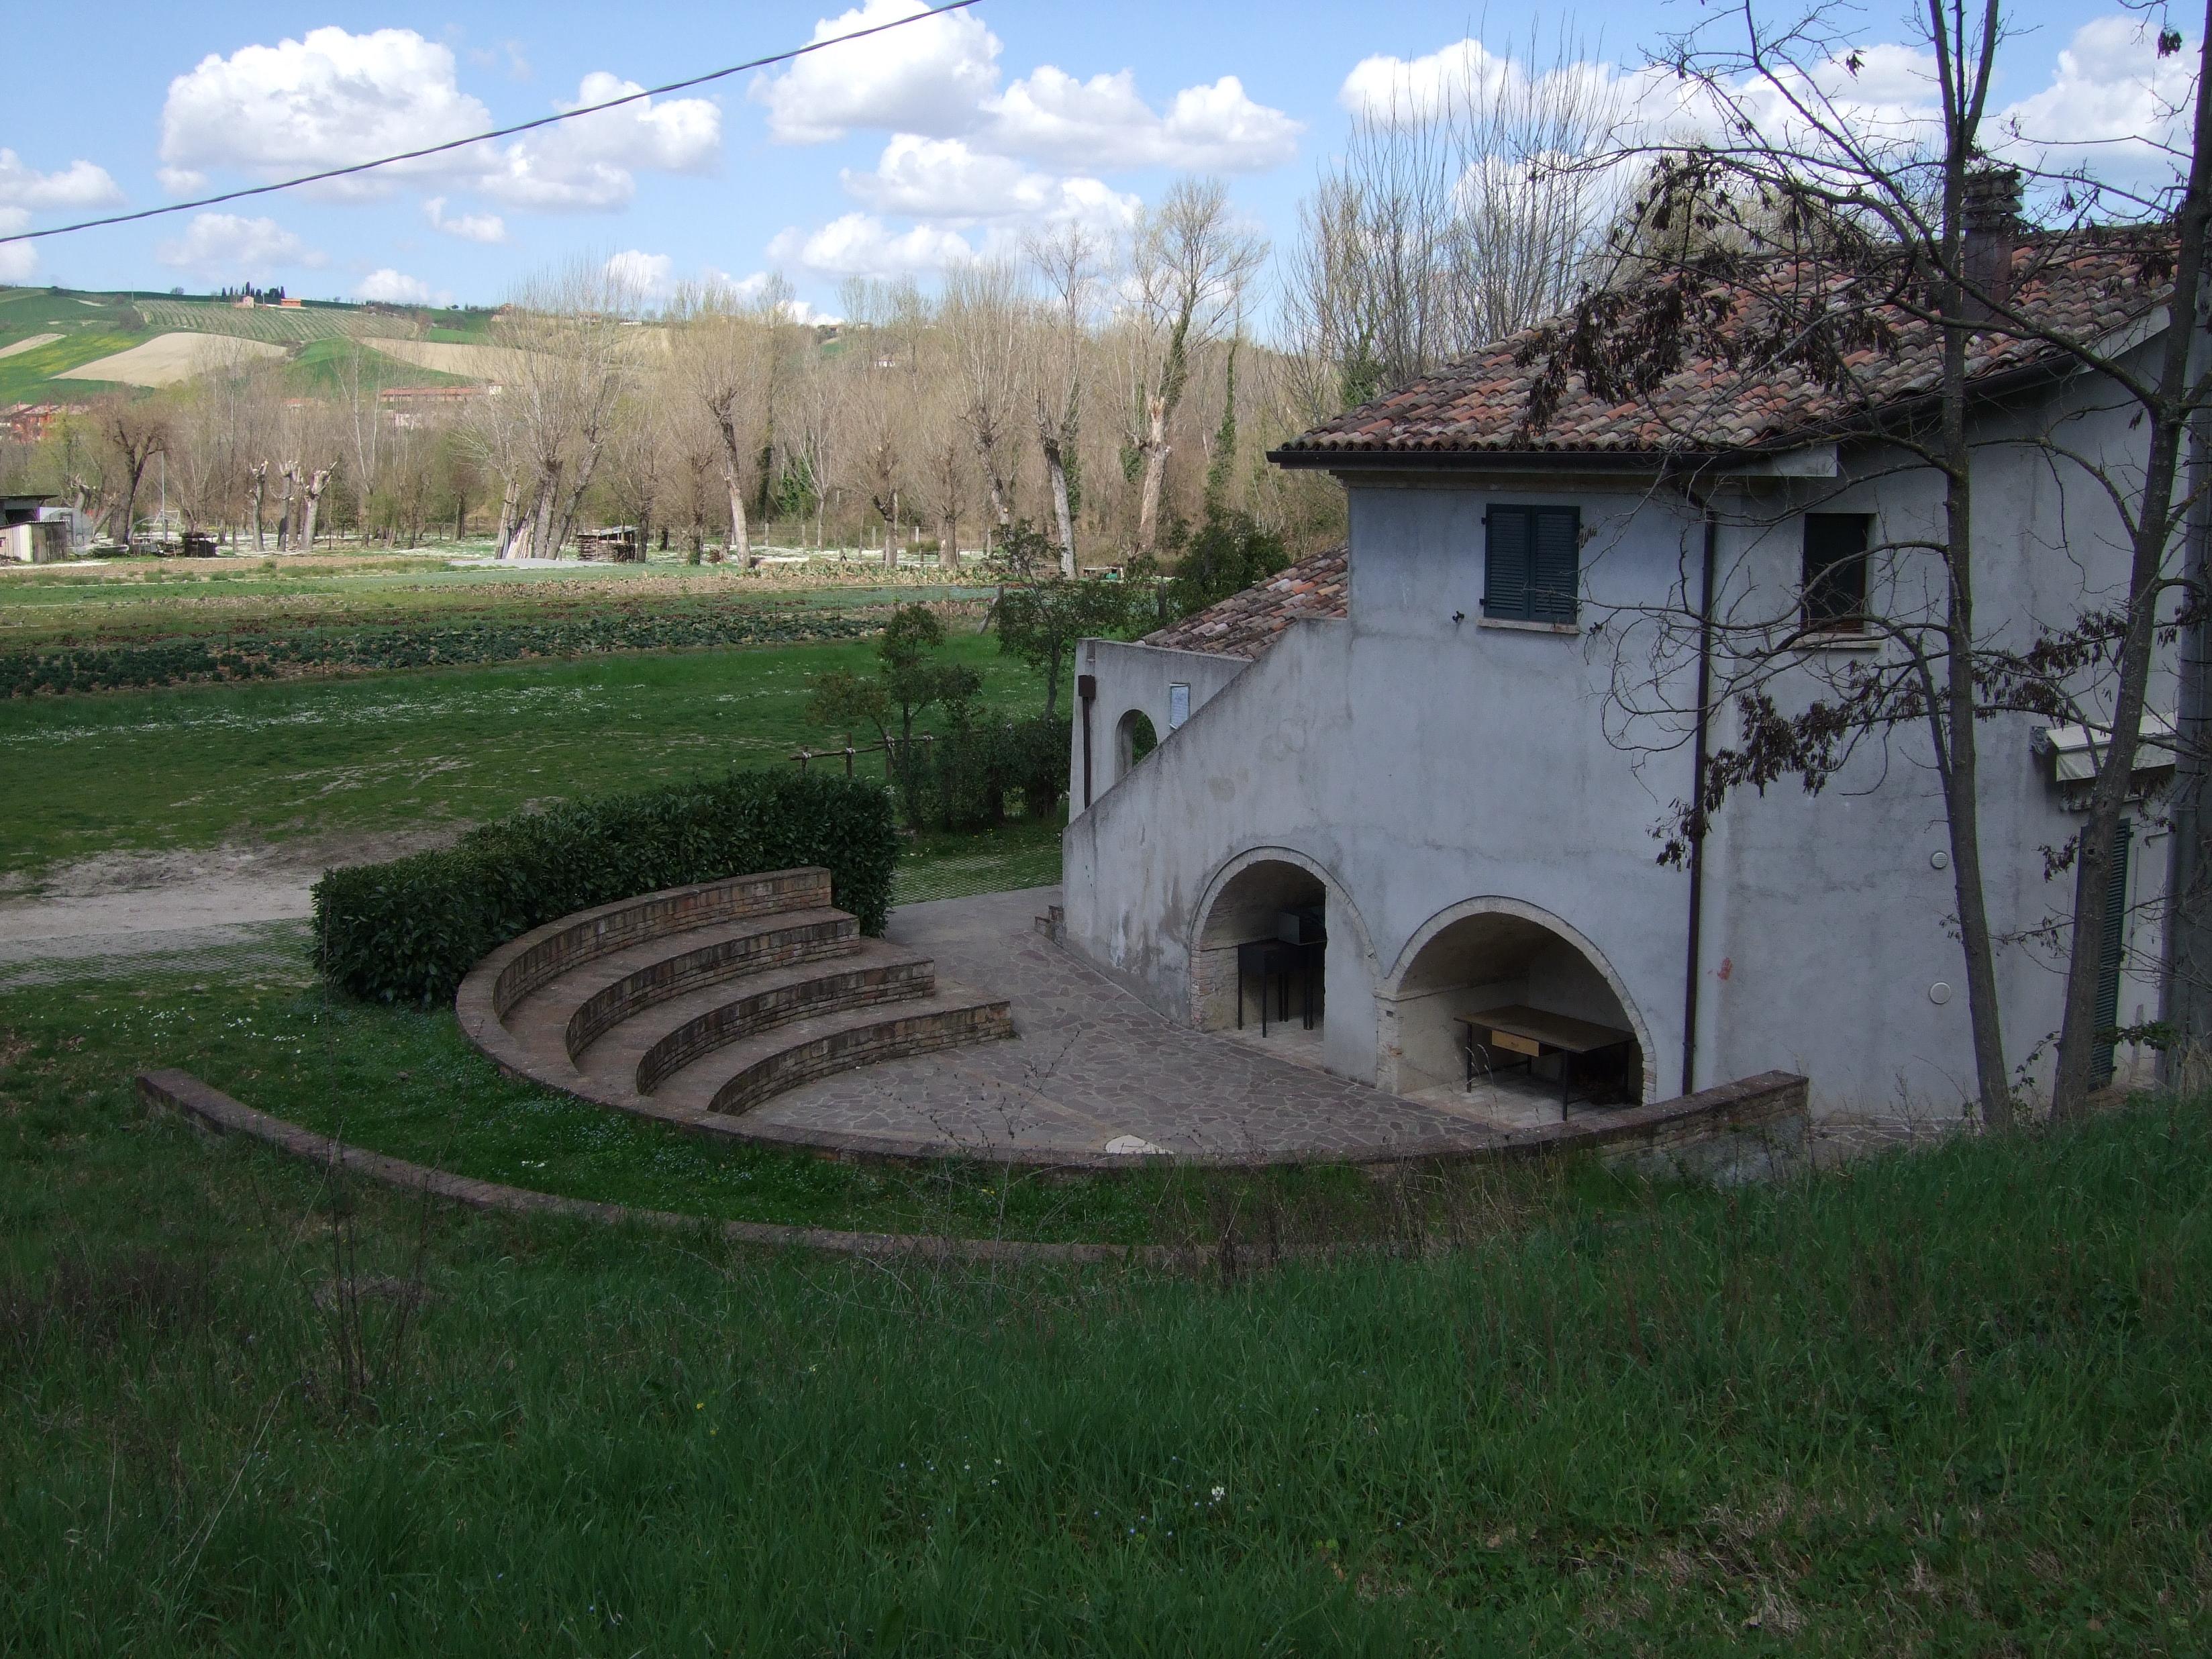 La Casa E Il Terreno Gruppo Scout A G E S C I Morciano Di Romagna 1